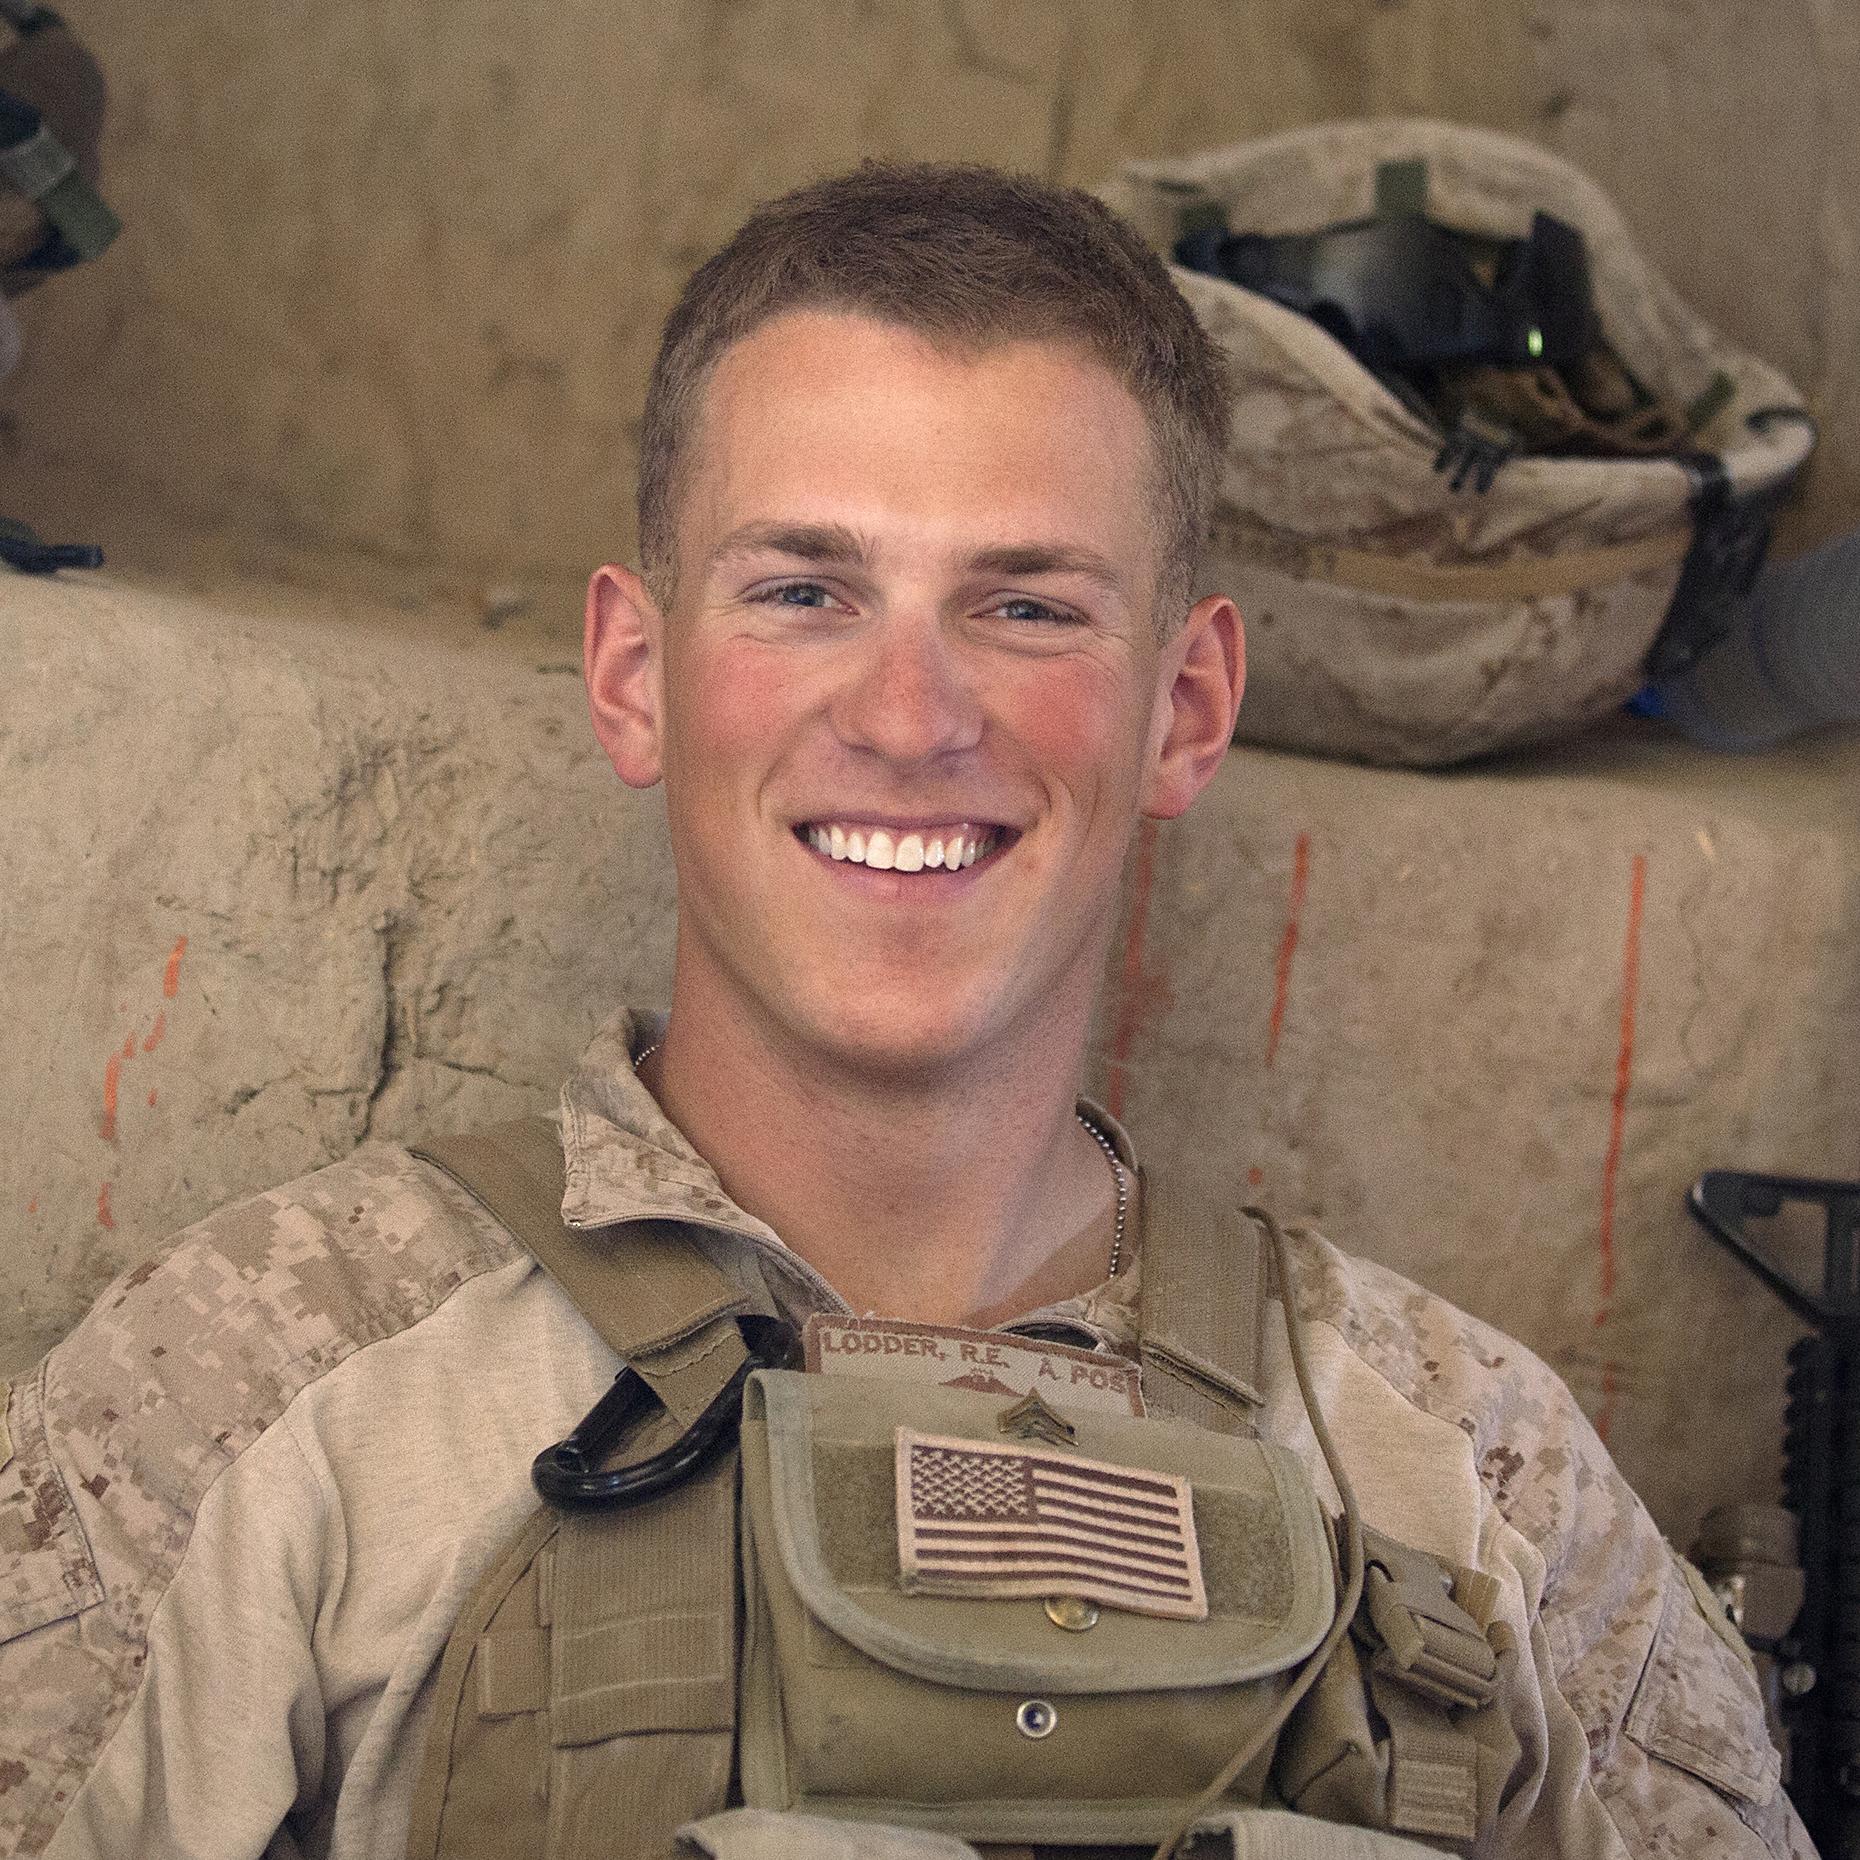 Reece-Lodder-Marine-Afghanistan-2011